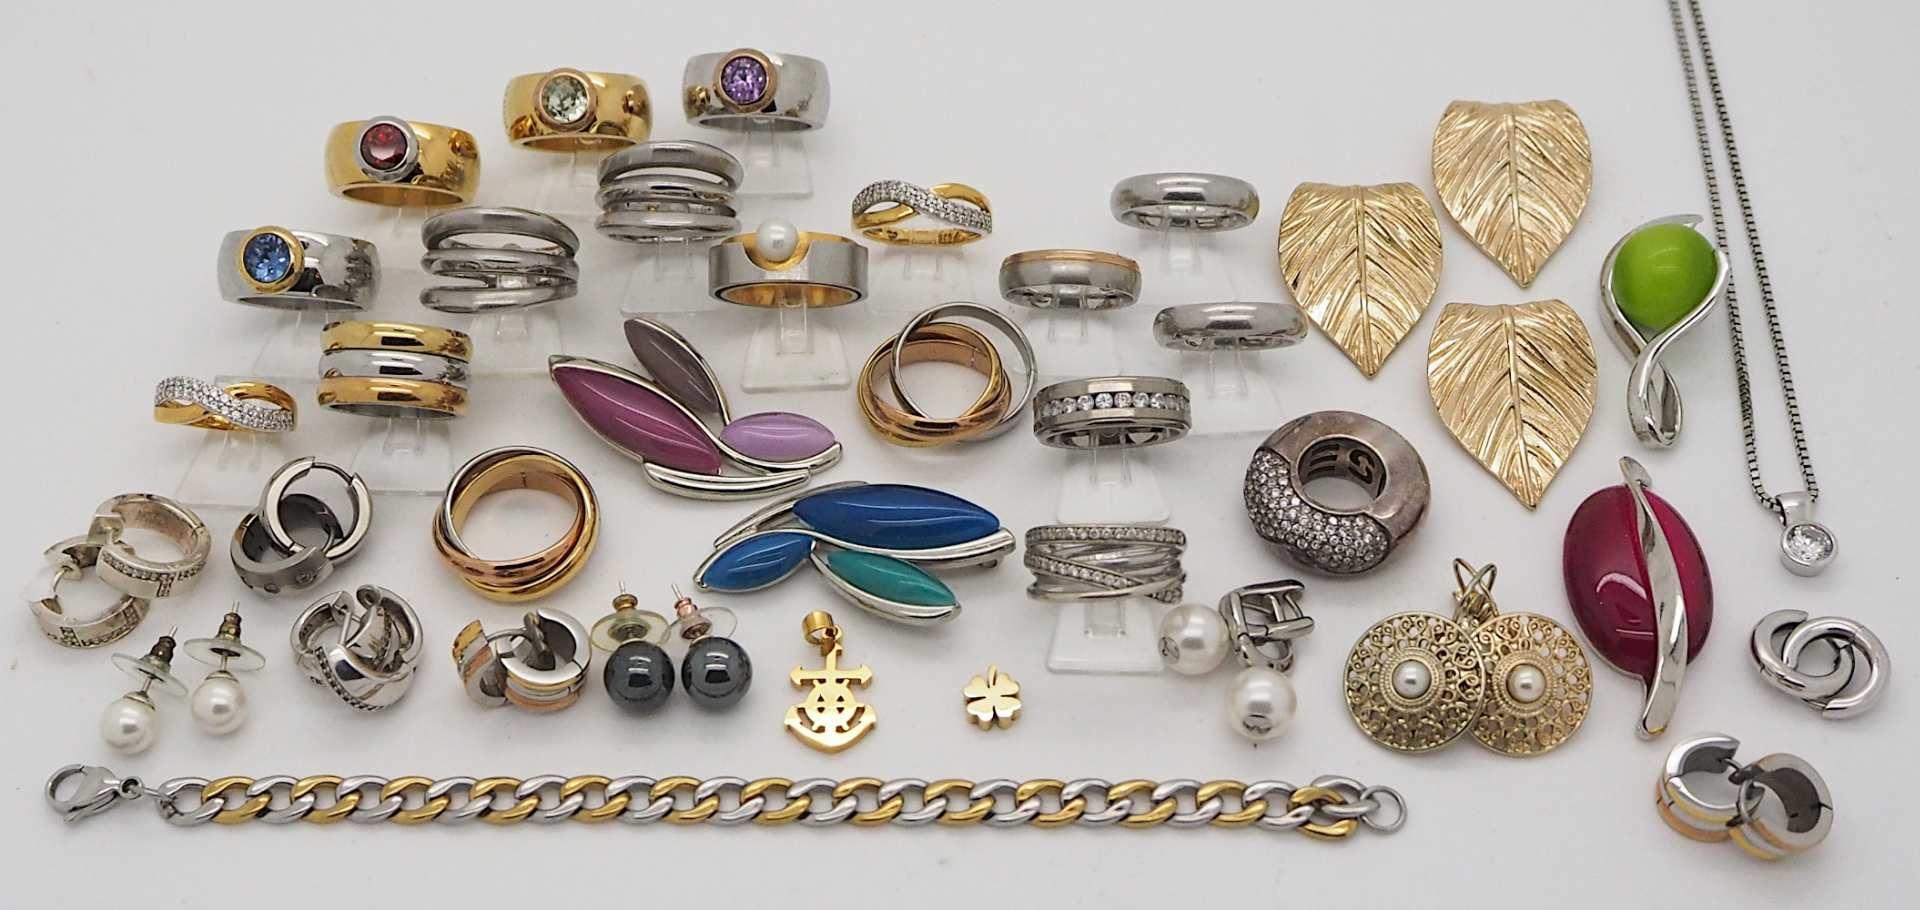 1 Konv. Schmuck Silber/Mode u.a. Edelstahl, Armbanduhren, in der Schatulle - Bild 2 aus 3